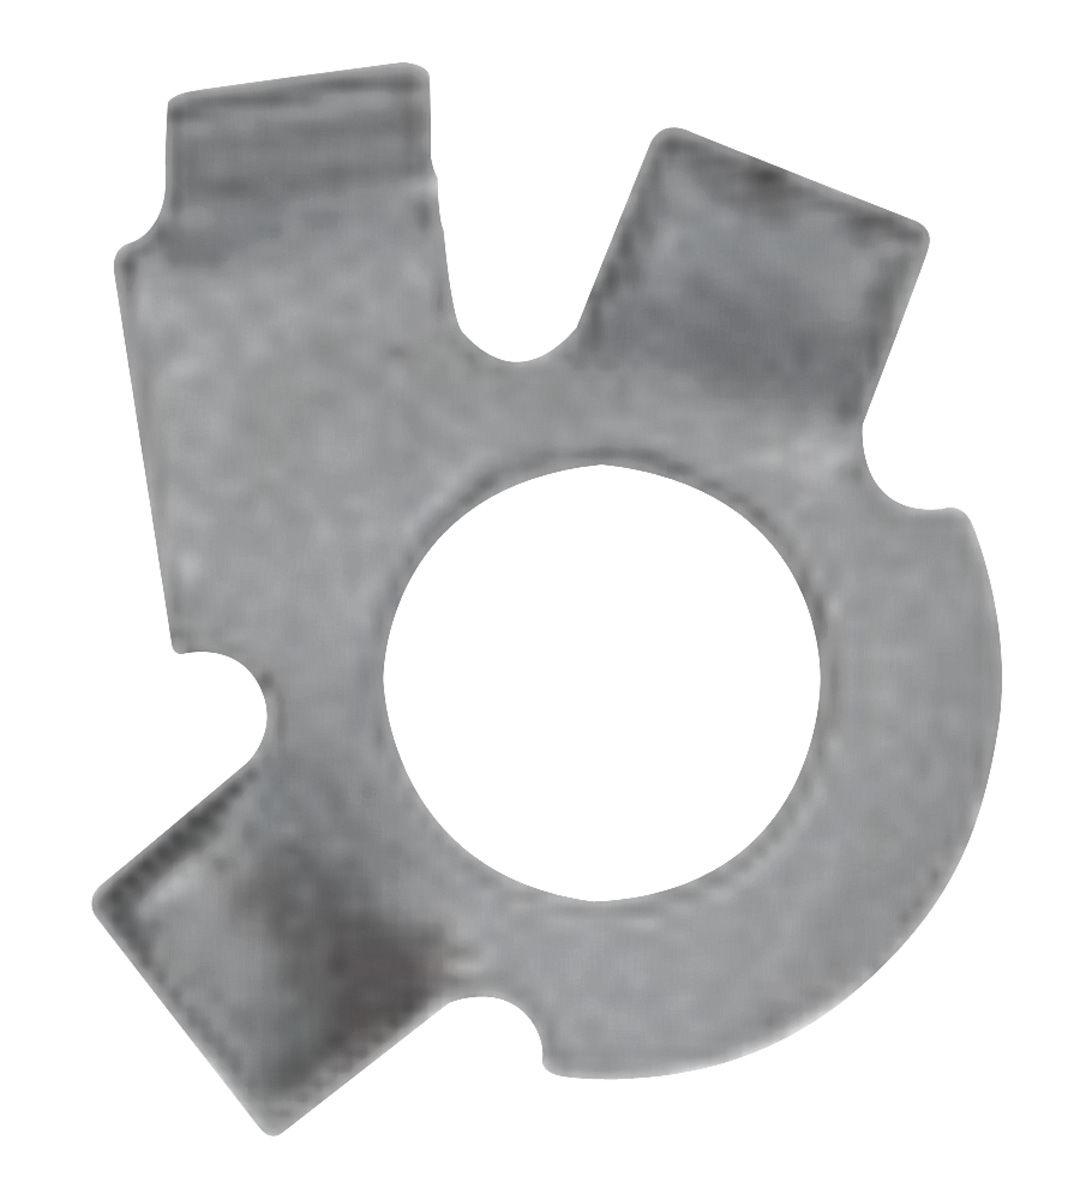 Bolt Lock, Exhaust Manifold, Pontiac